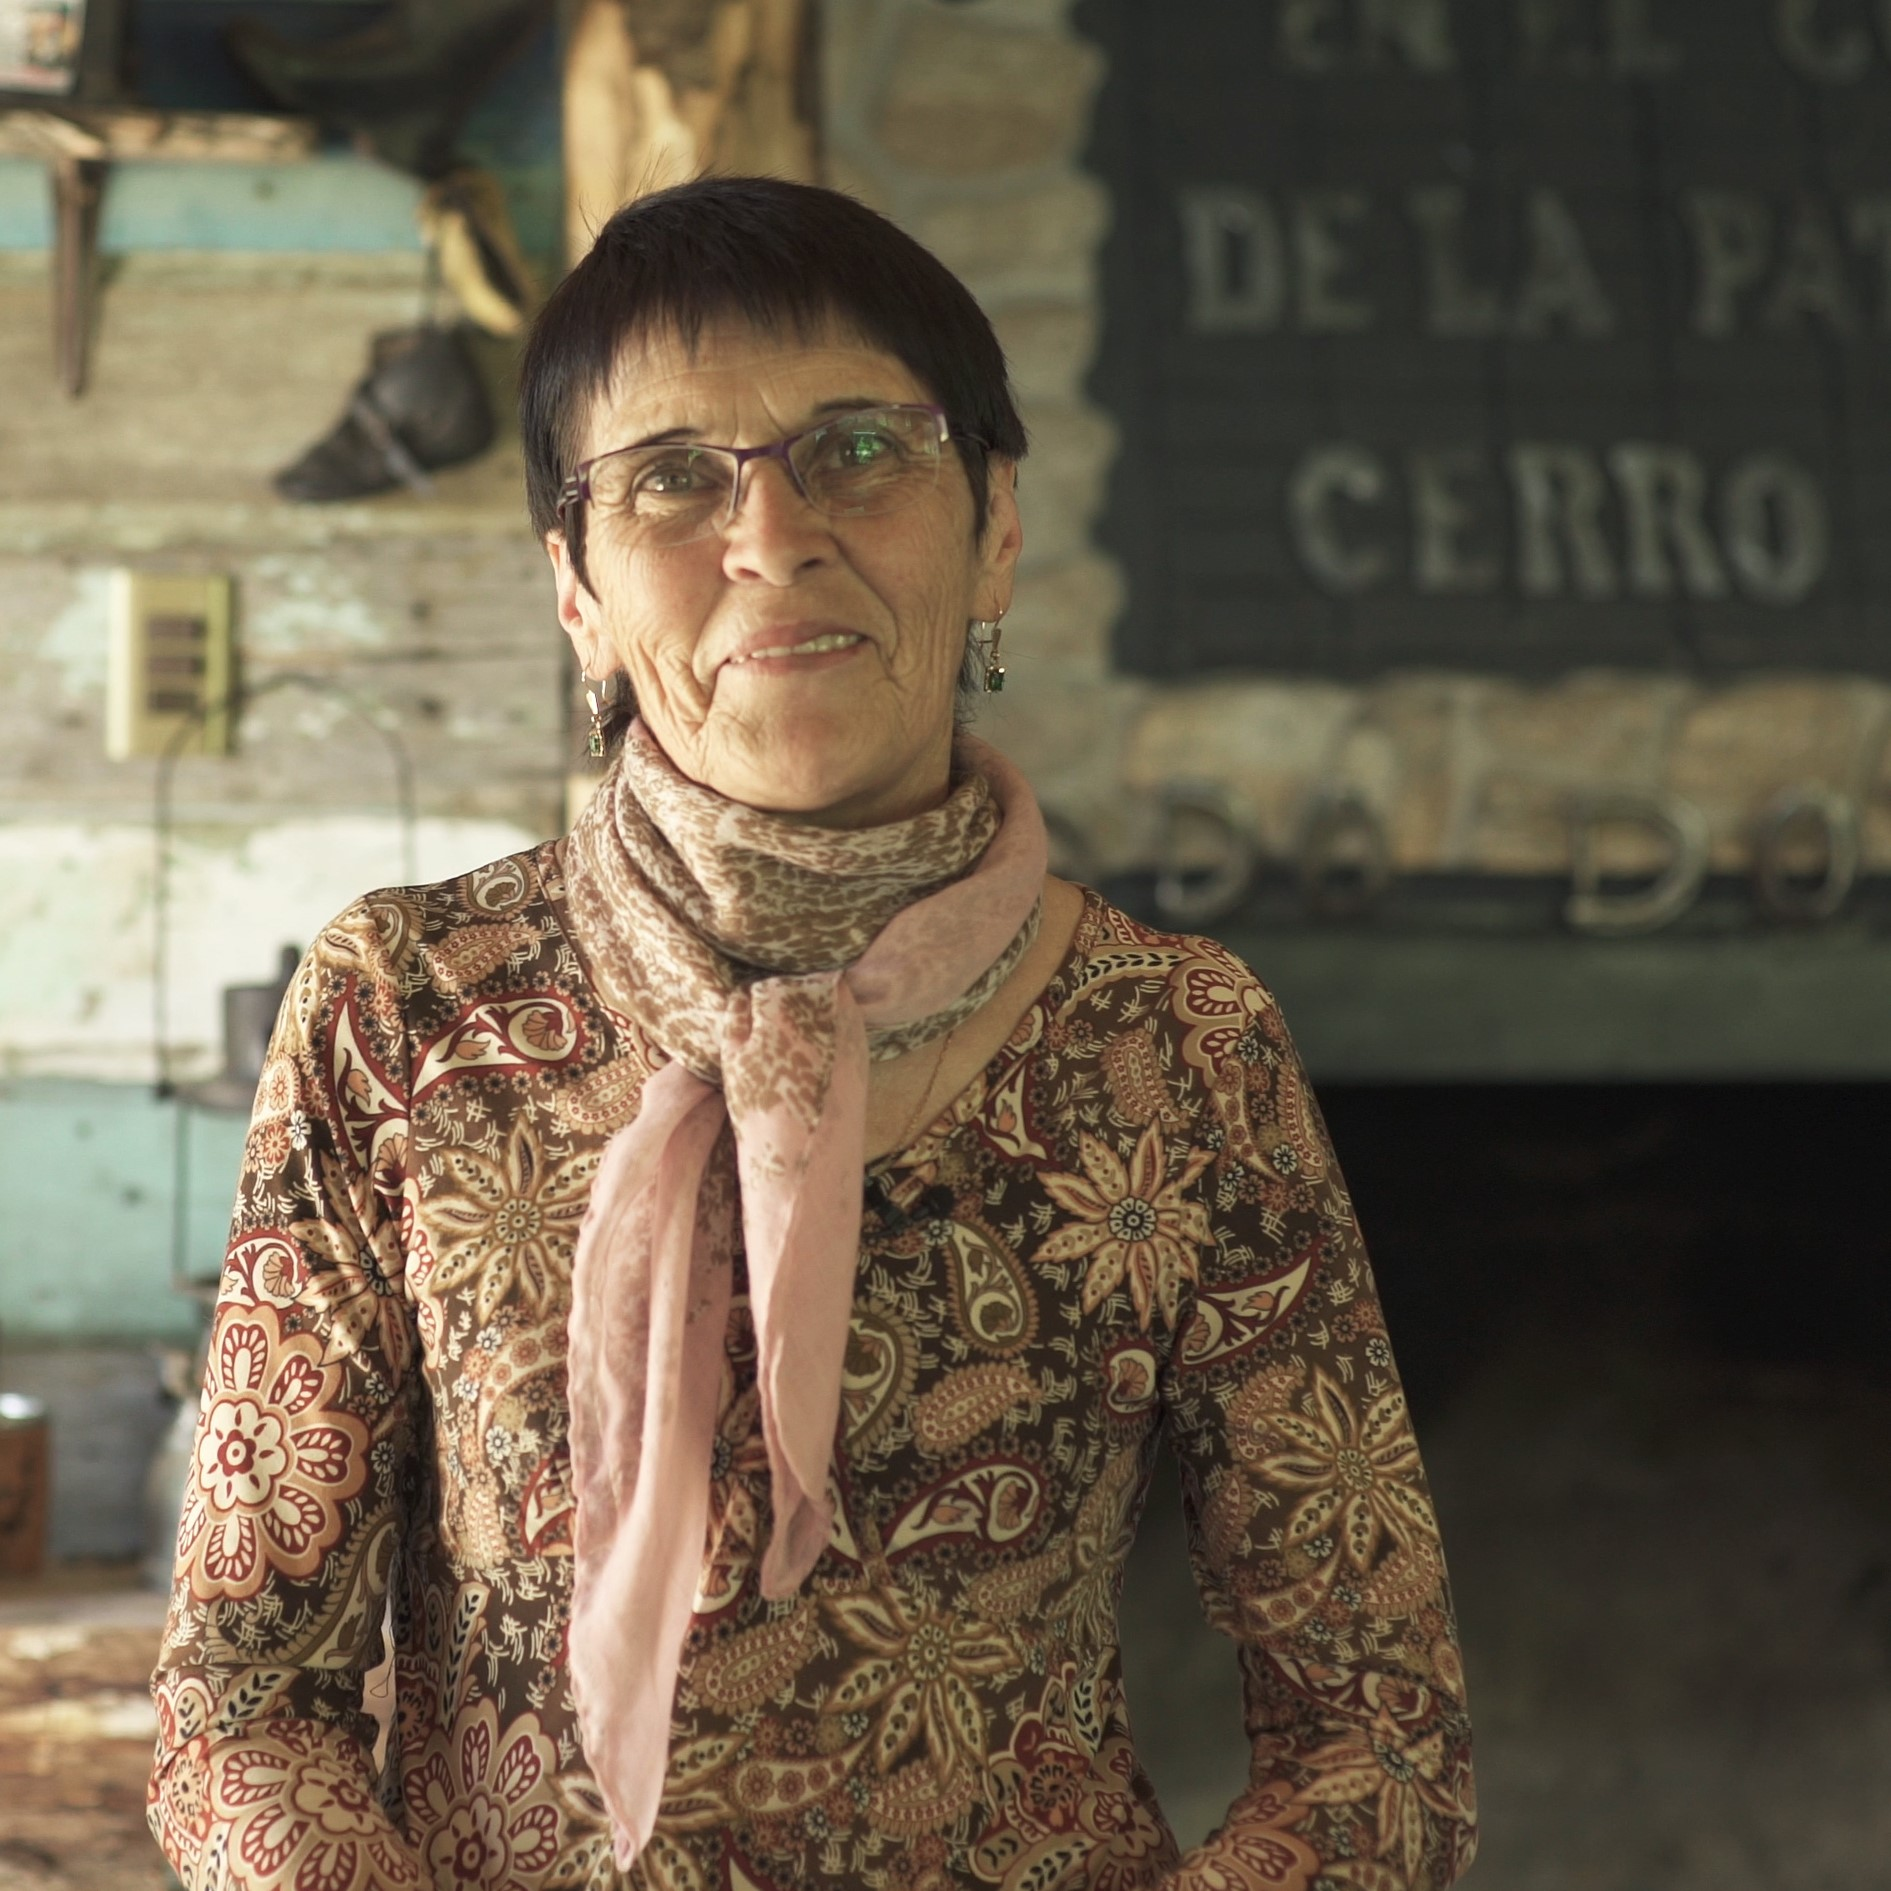 Lida Mardones Almonacid